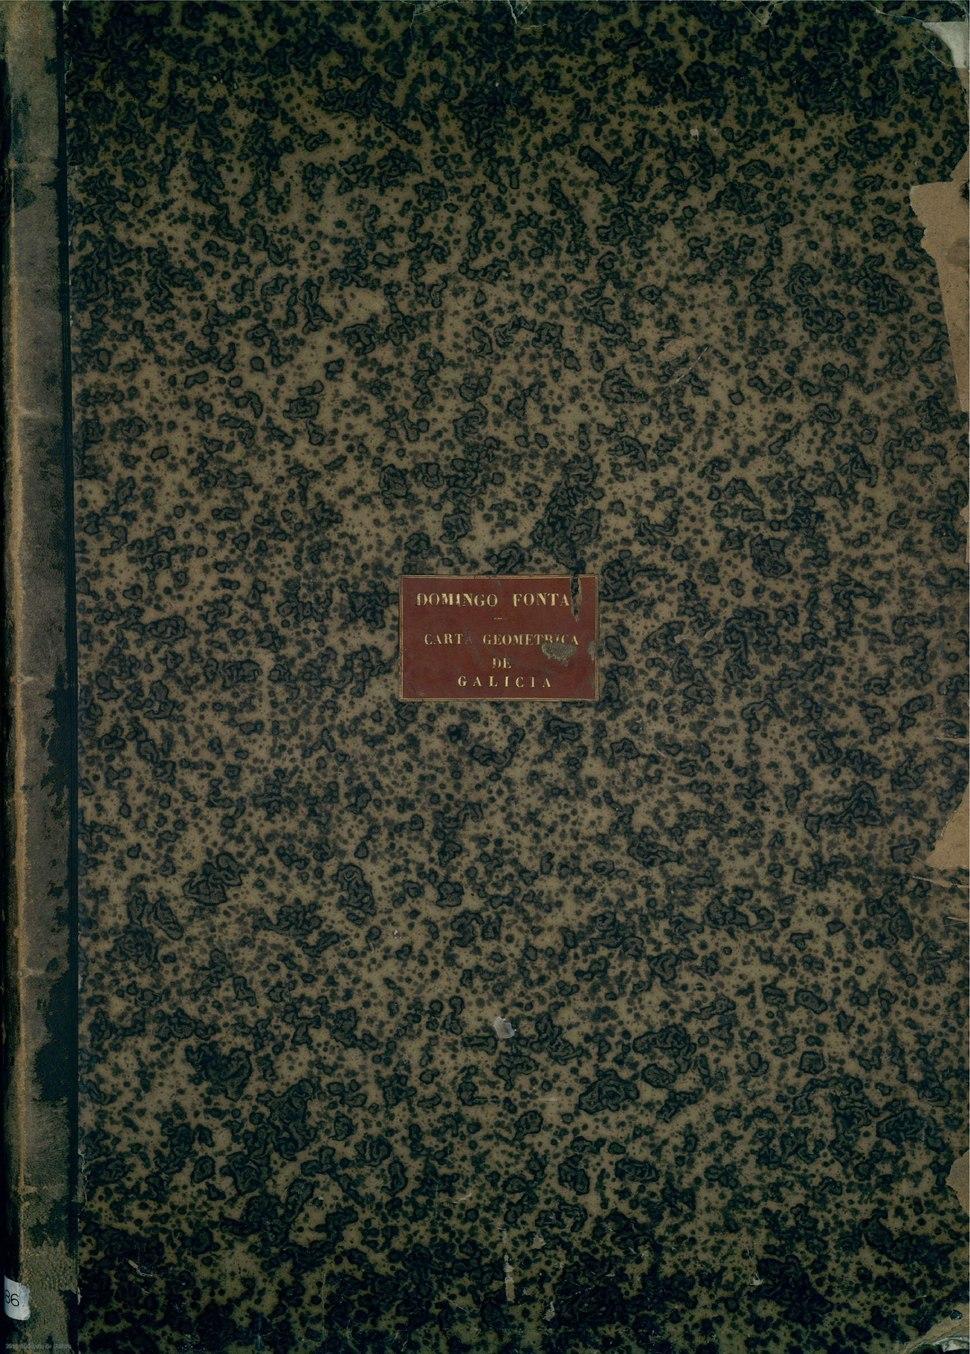 Carta geométrica de Galicia, en PDF (exemplar da biblioteca do Museo Naval).